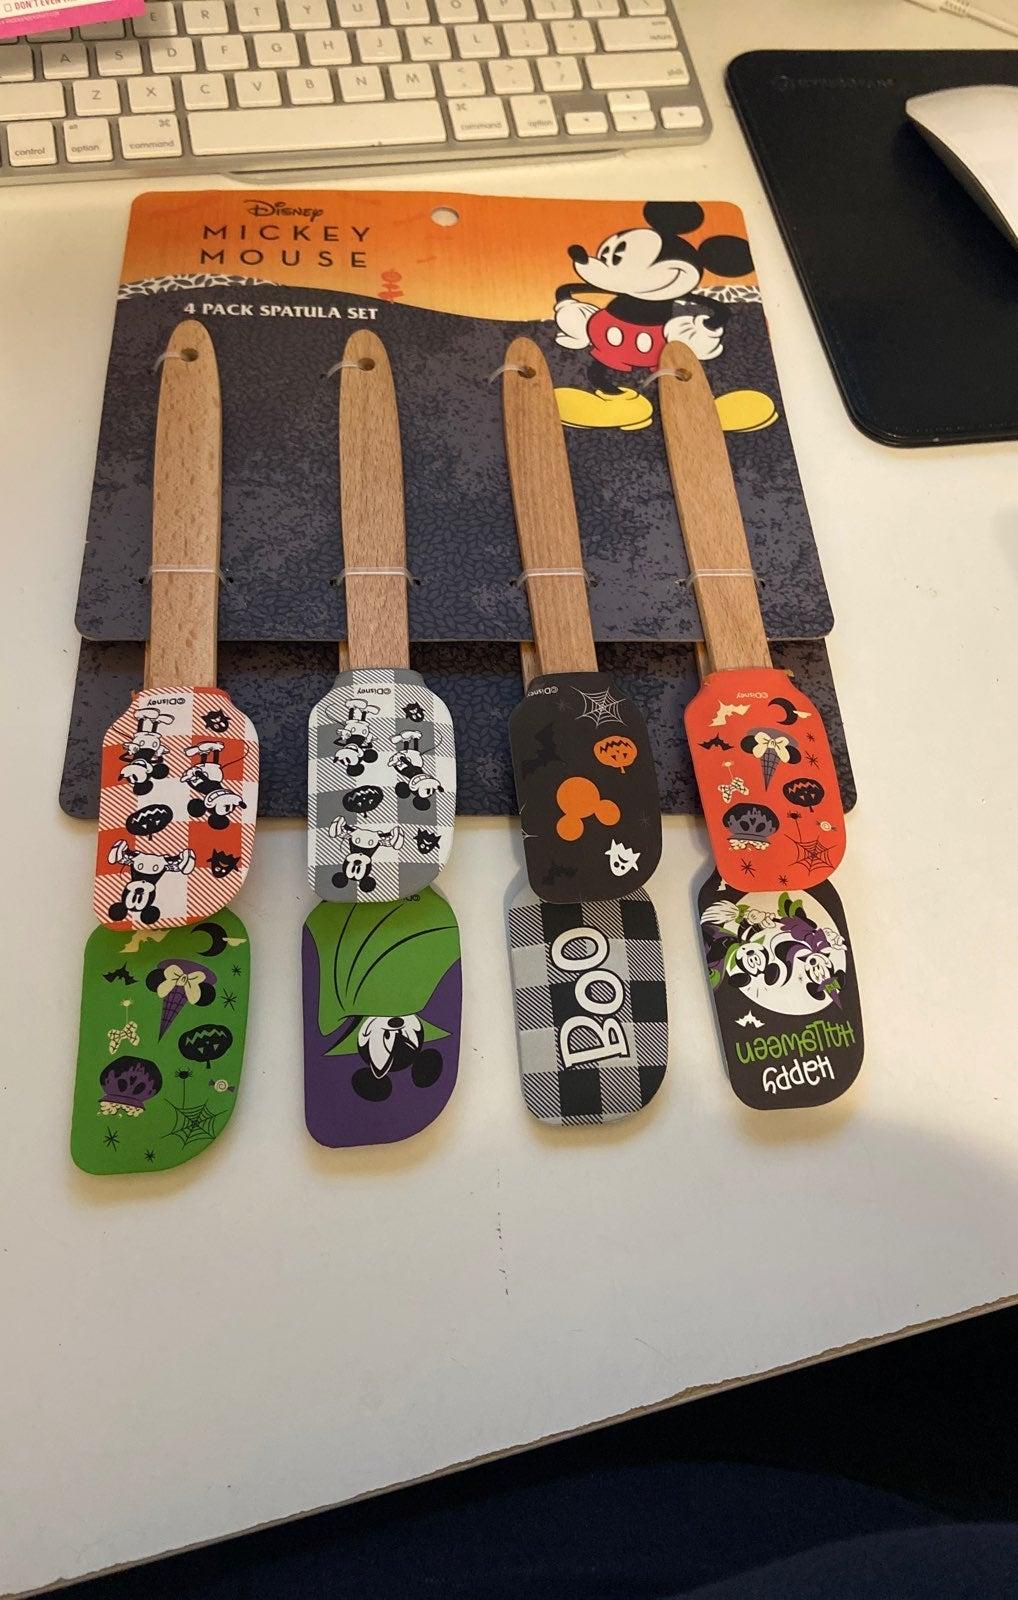 Mickey mouse spatulas